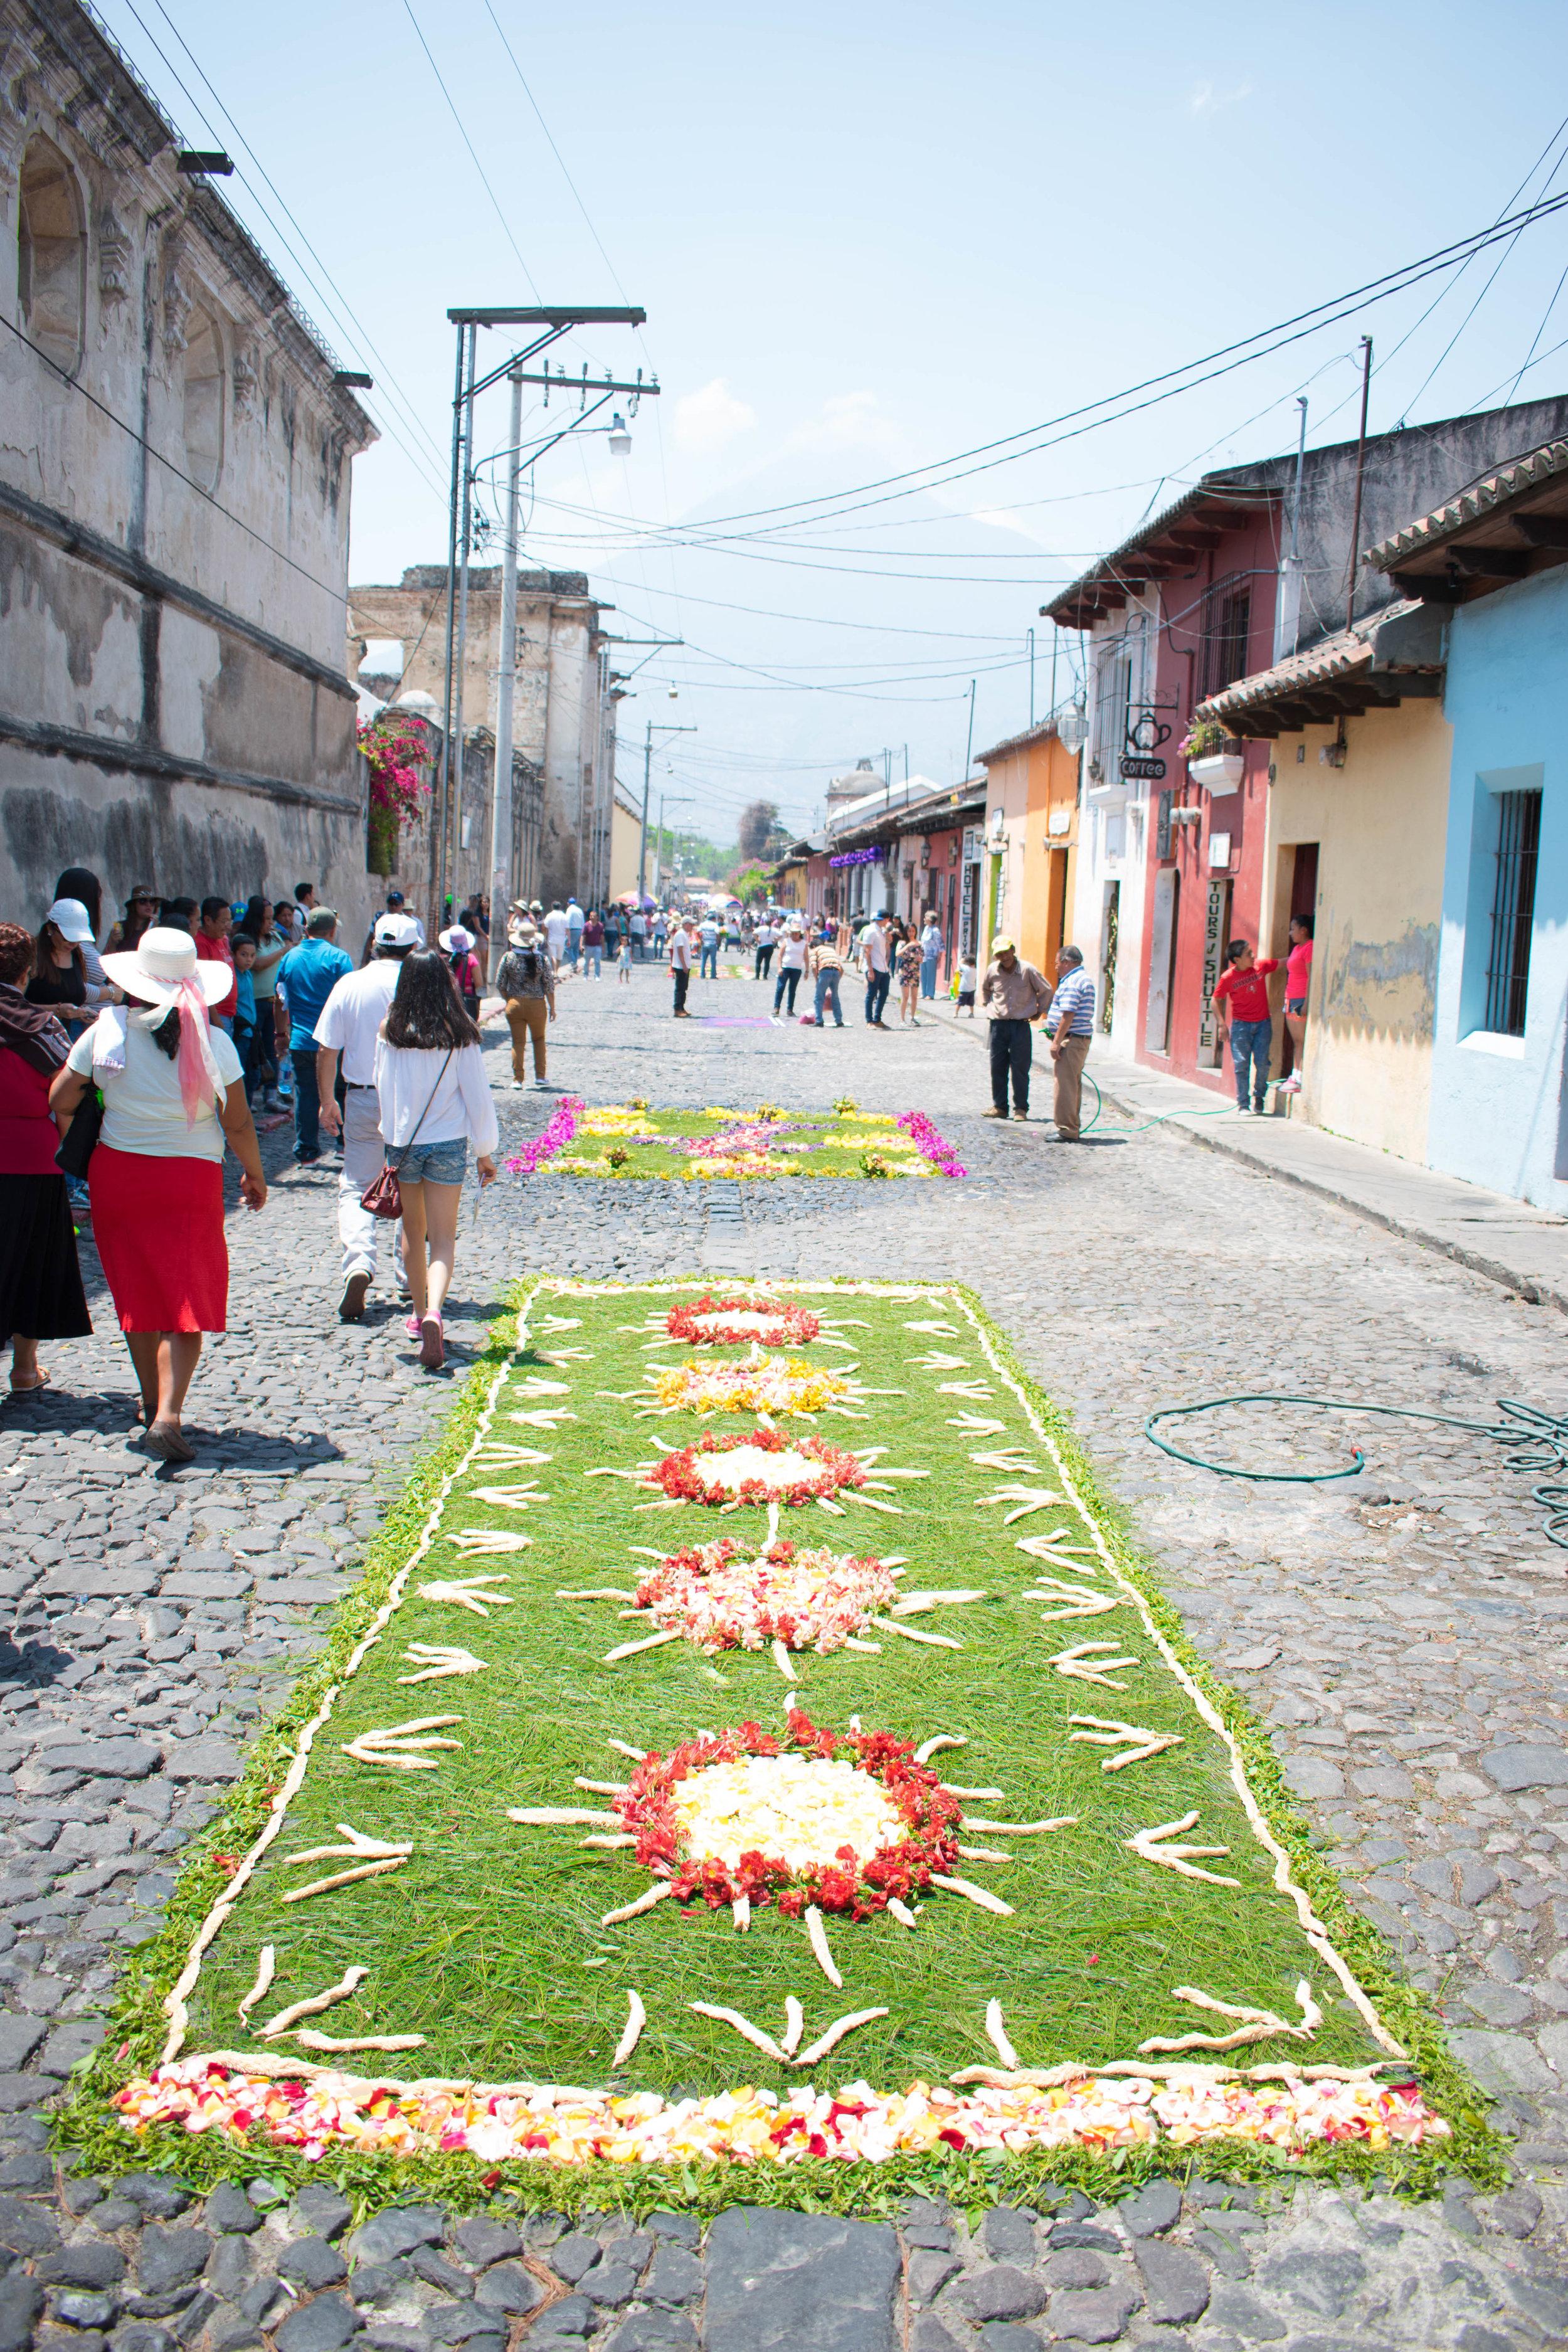 Colourful Carpets in Honour of Semana Santa in Antigua, Guatemala